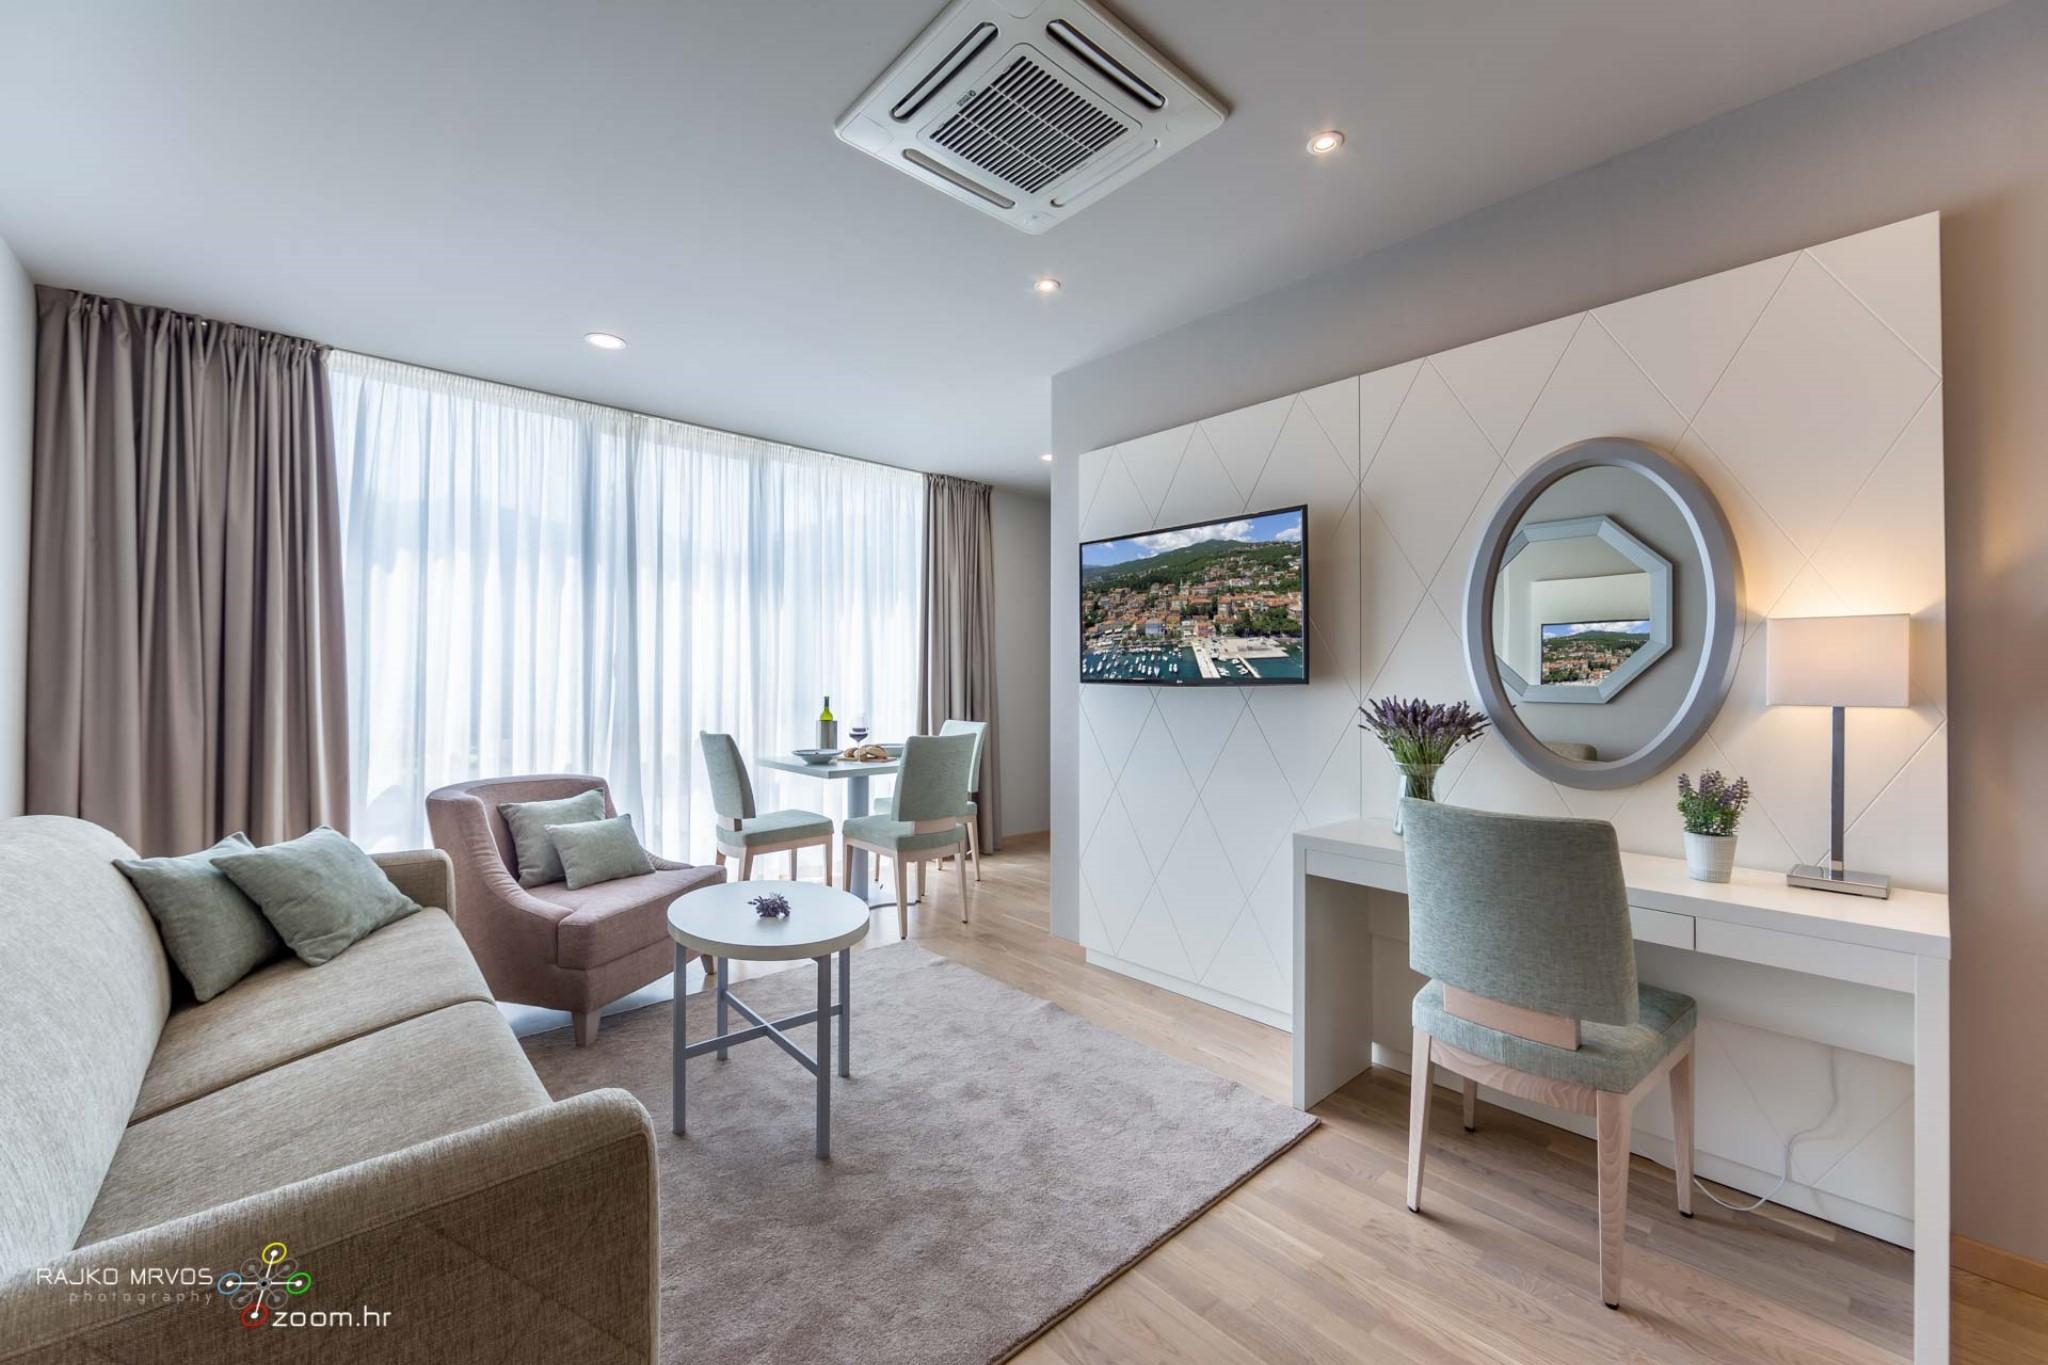 fotografiranje-interijera-fotograf-eksterijera-apartmana-vila-kuca-apartman-Preelook-4